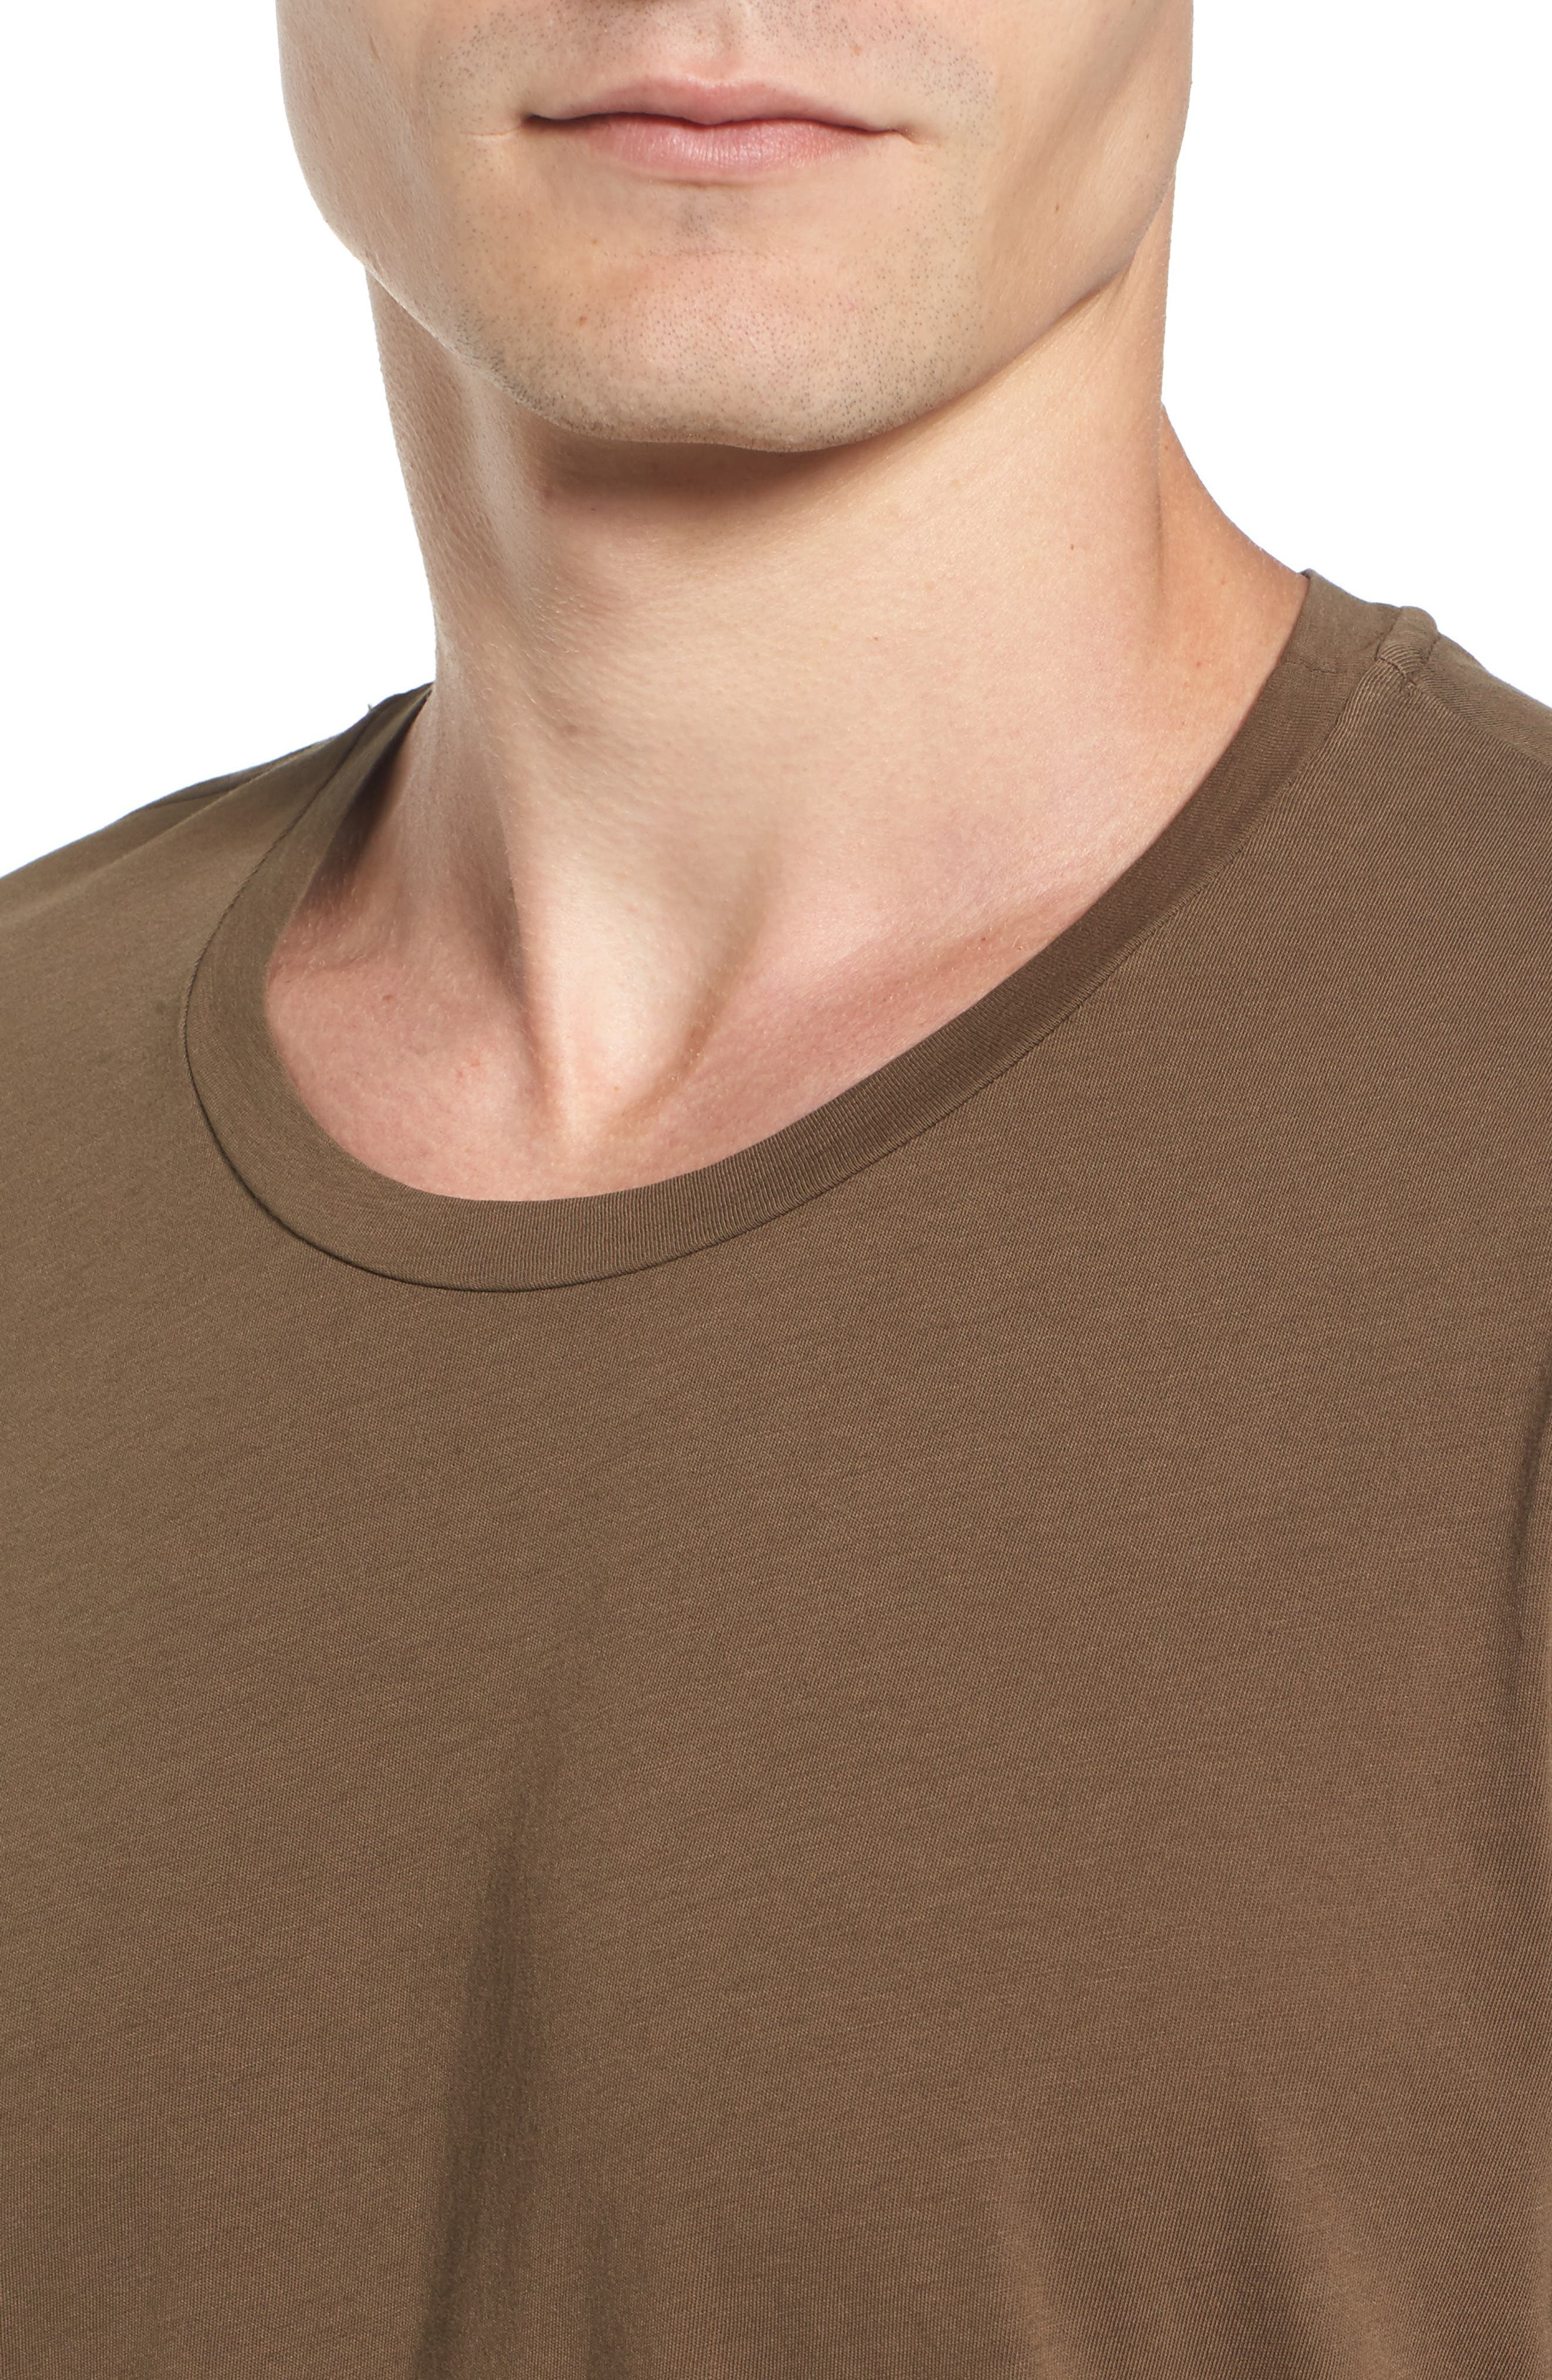 'Howard' Crewneck T-Shirt,                             Alternate thumbnail 4, color,                             Conifer